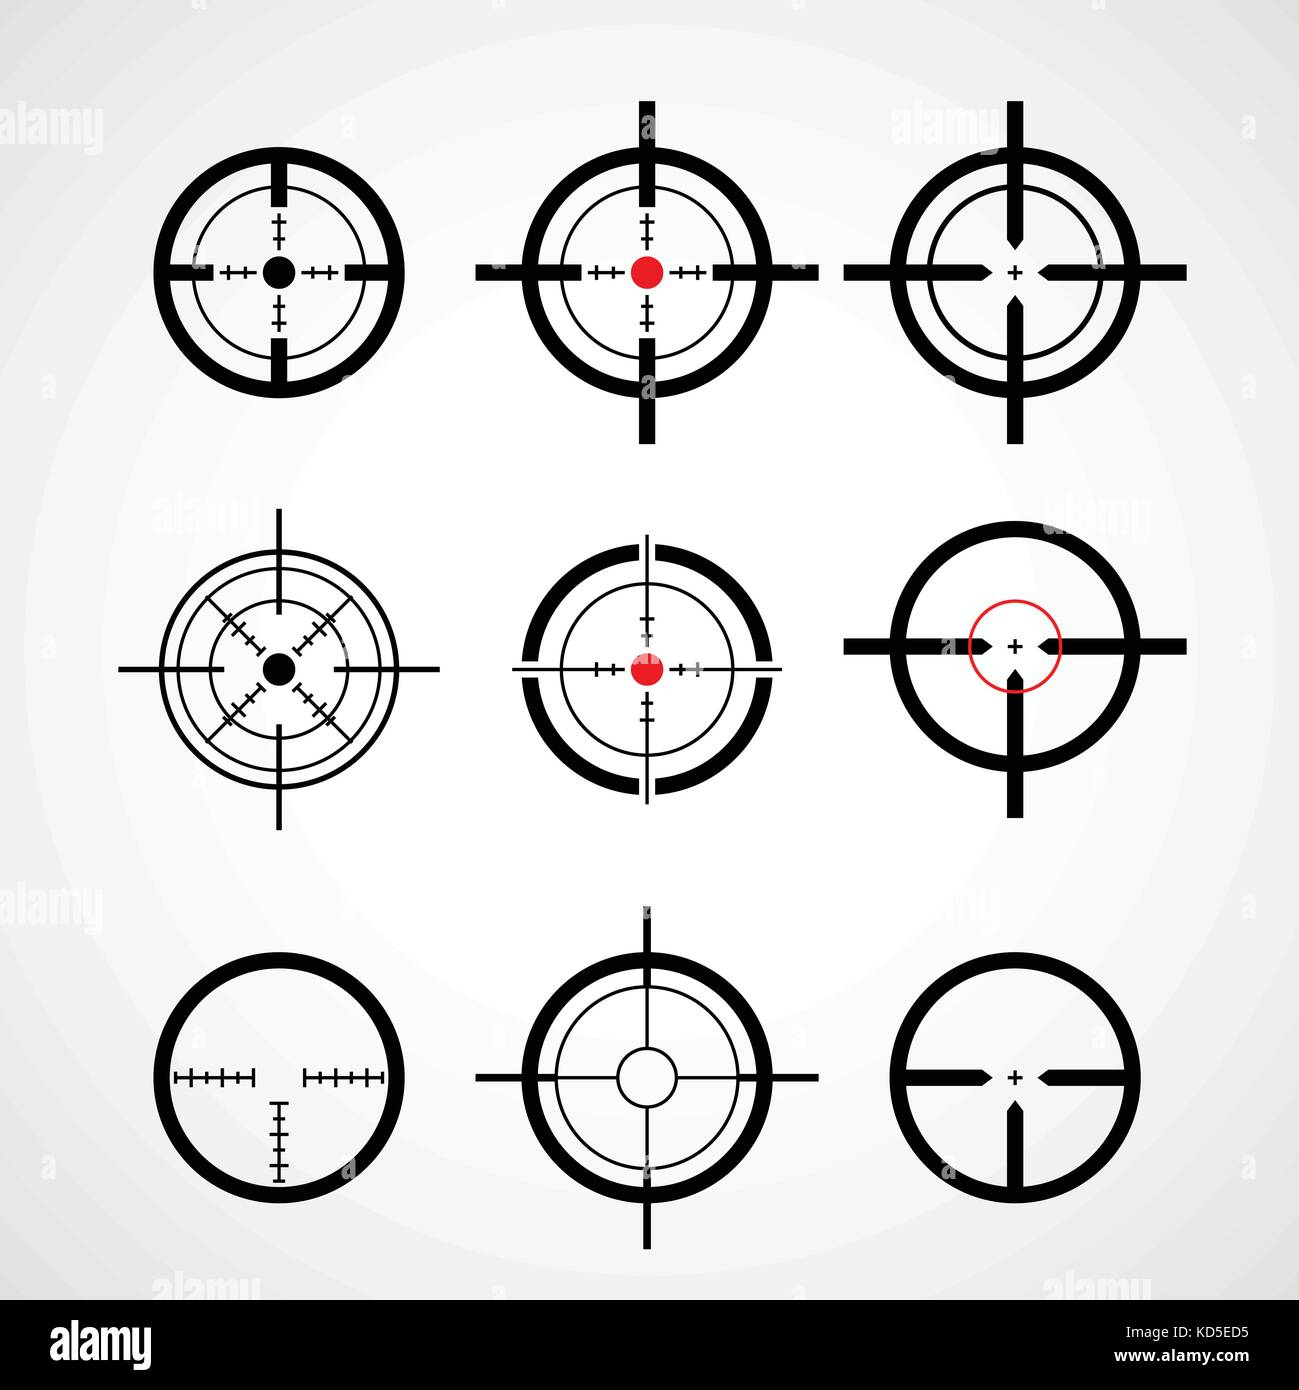 Sniper sight symbol crosshair target stock photos sniper sight crosshair gun sight target icons set stock image buycottarizona Image collections